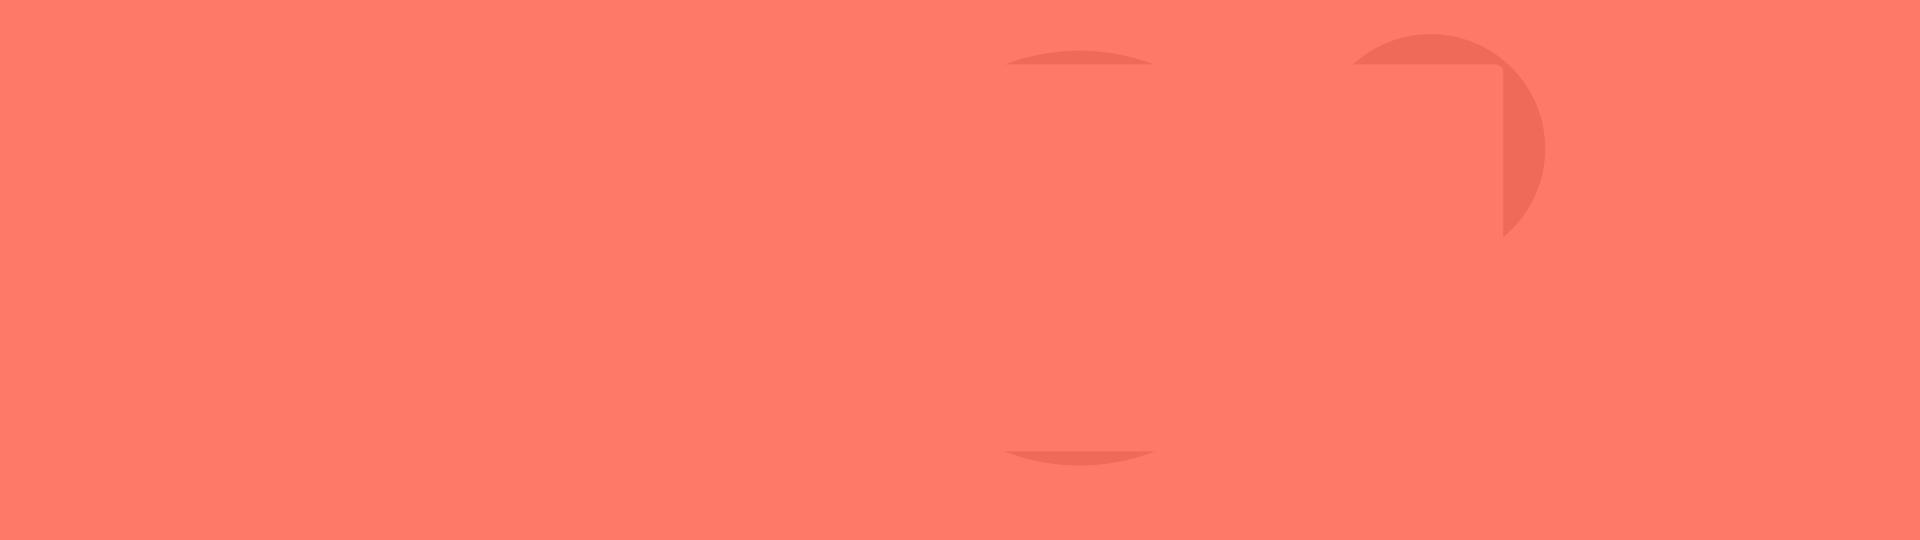 CATEGORY-PETSHP-ENSEVILENPETSHOPURUNLERI-05-12